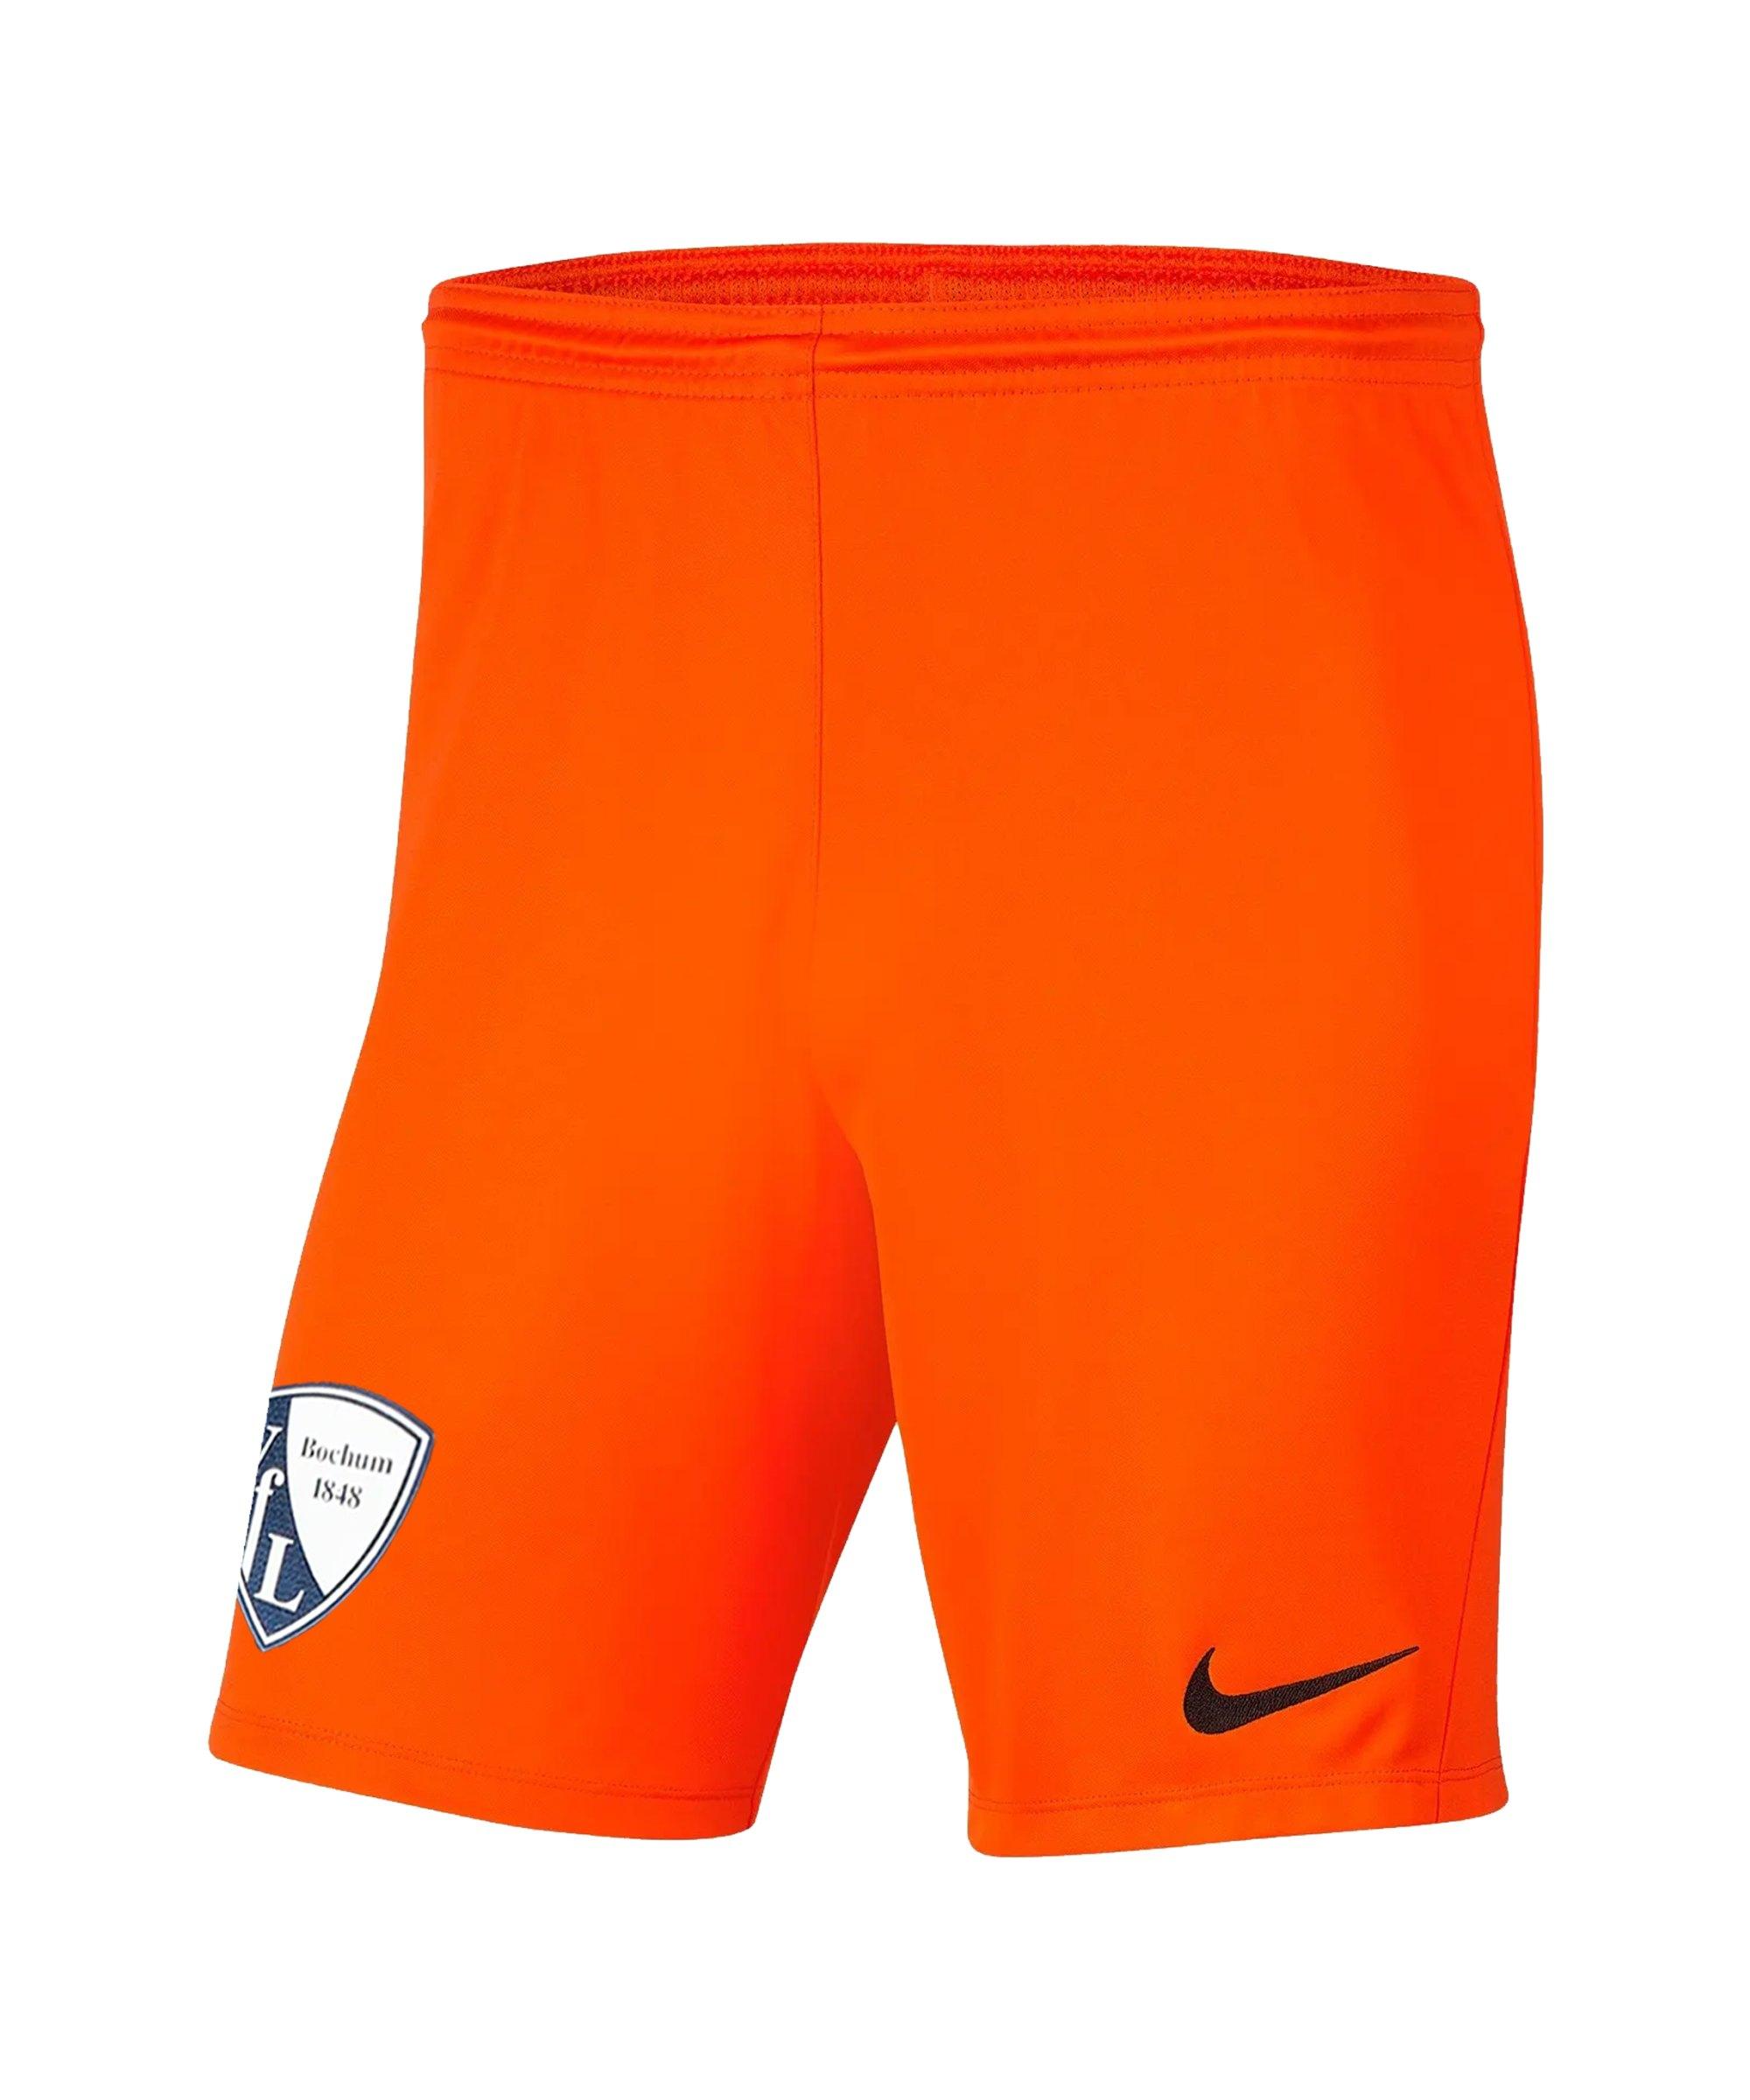 Nike VfL Bochum Torwartshort 2021/2022 Orange F819 - orange